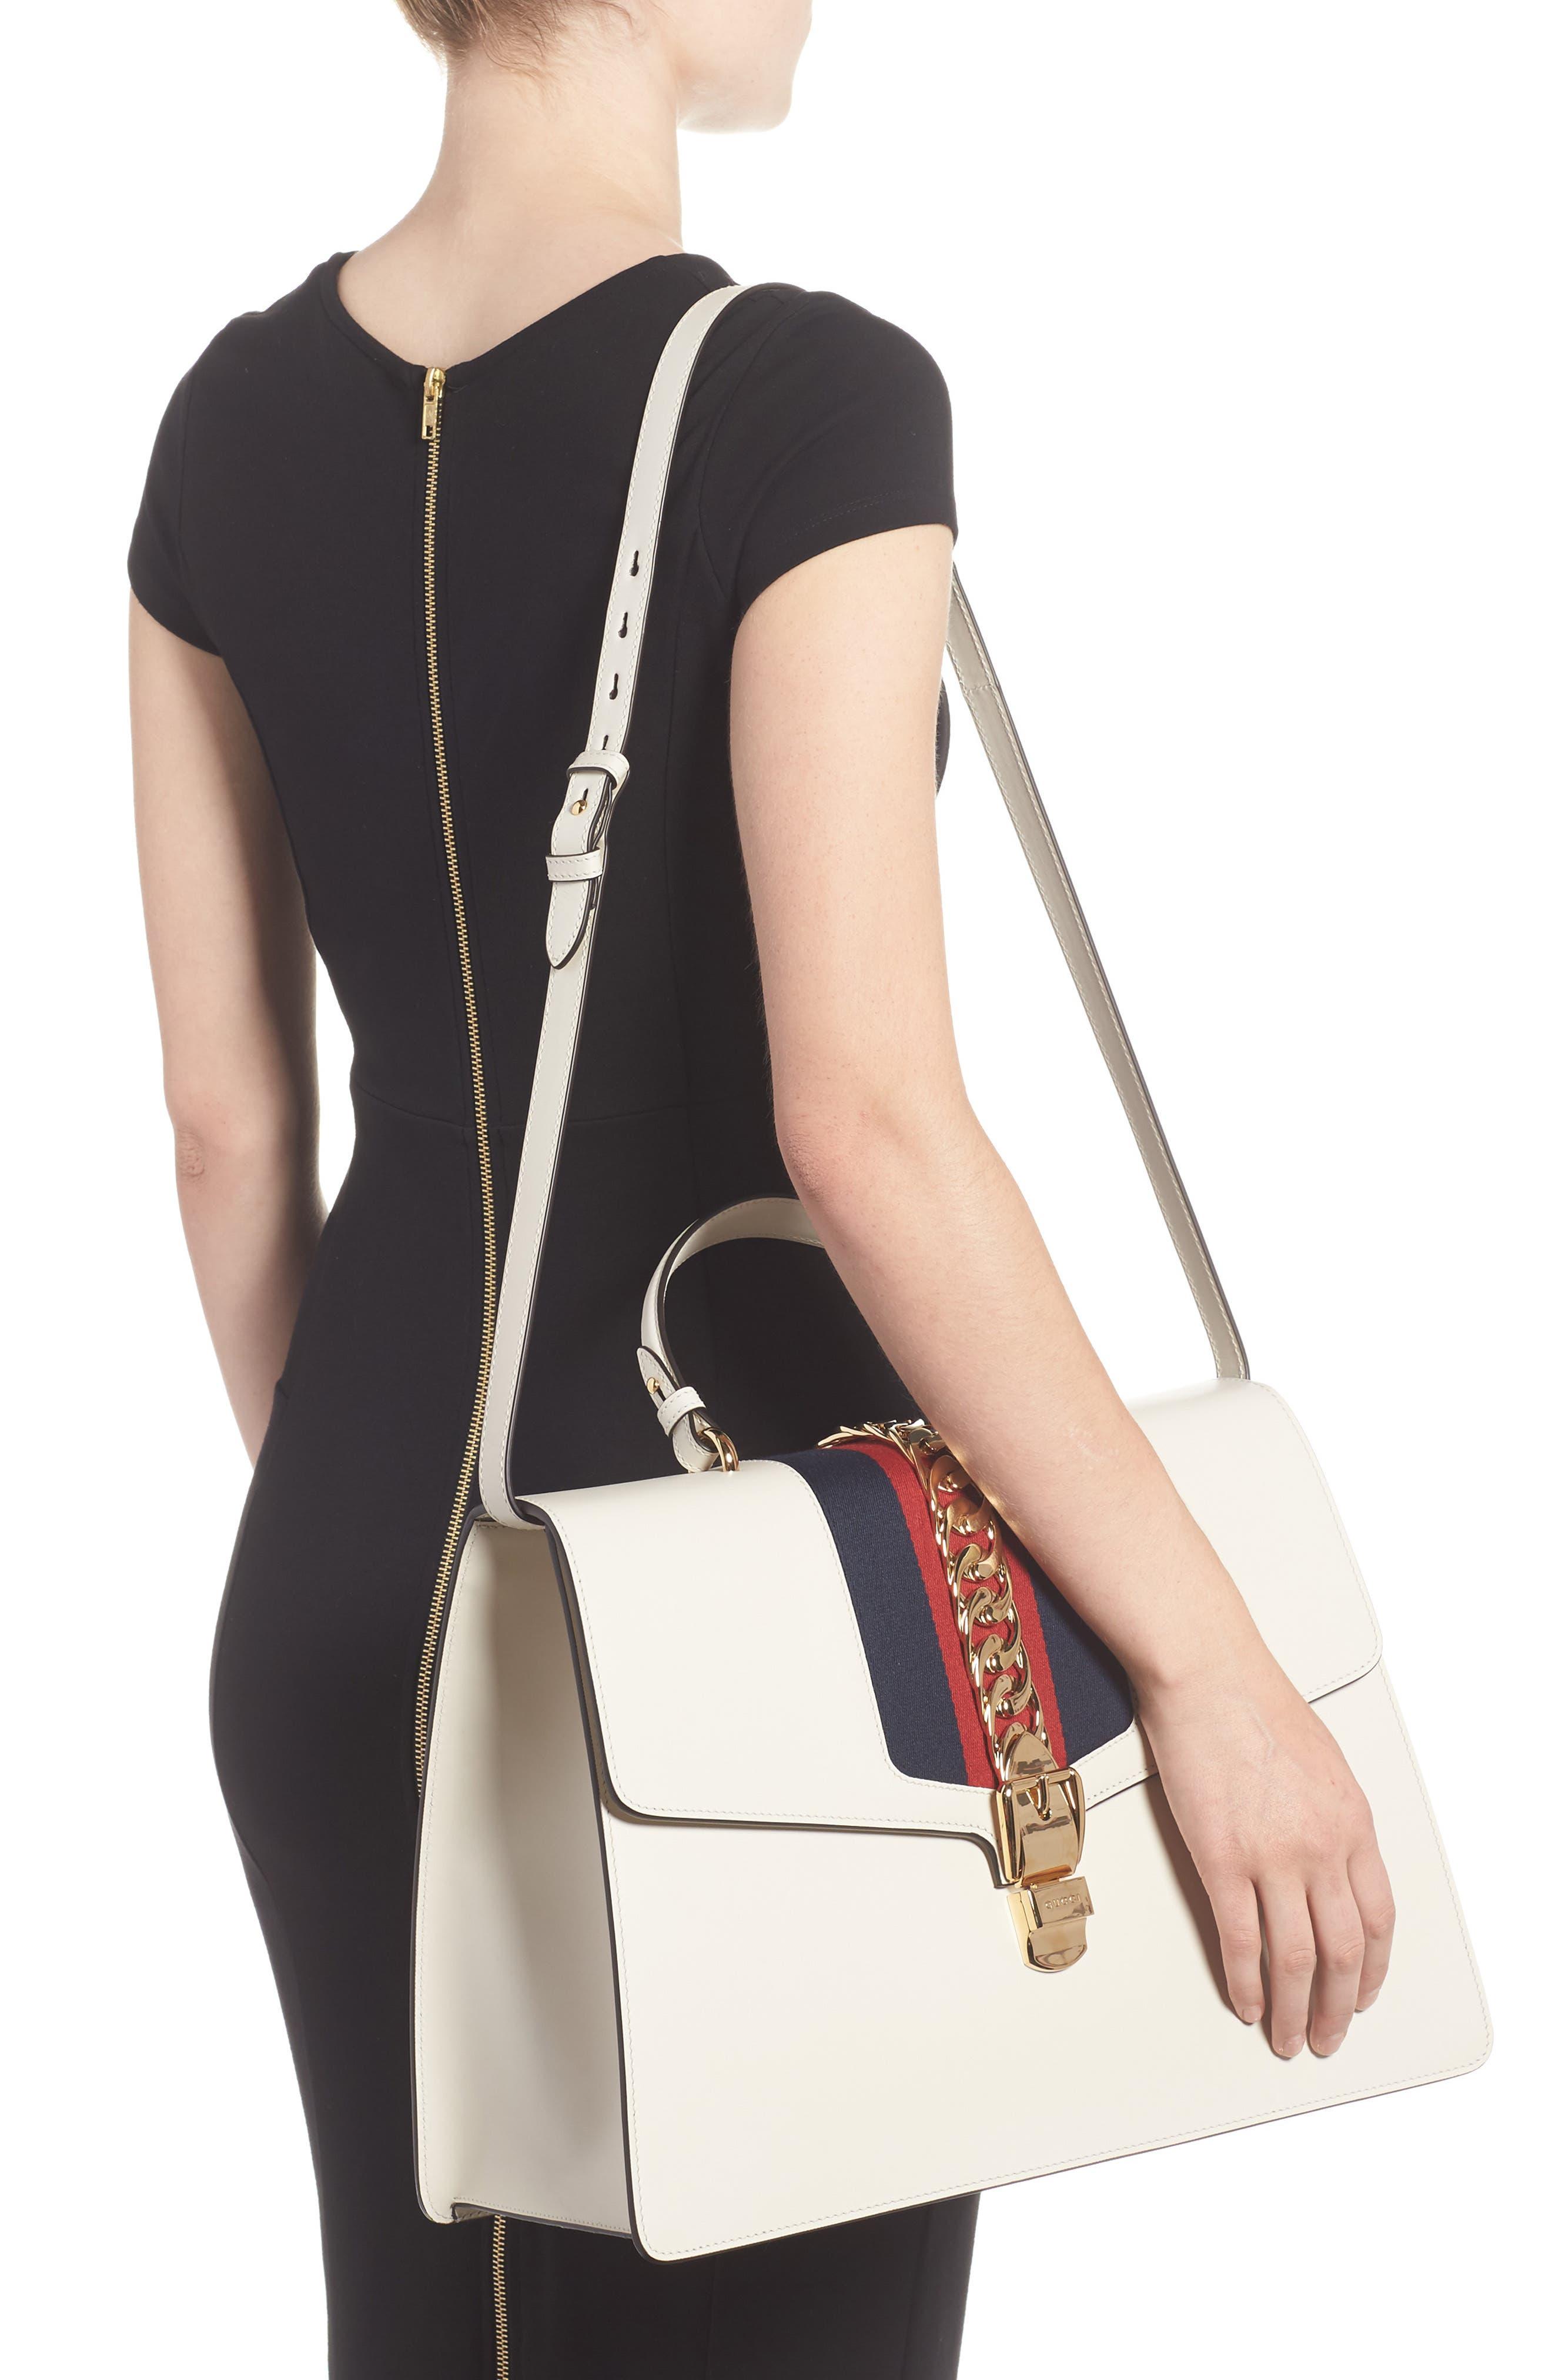 Maxi Sylvie Top Handle Leather Shoulder Bag,                             Alternate thumbnail 2, color,                             MYSTIC WHITE/ BLUE RED